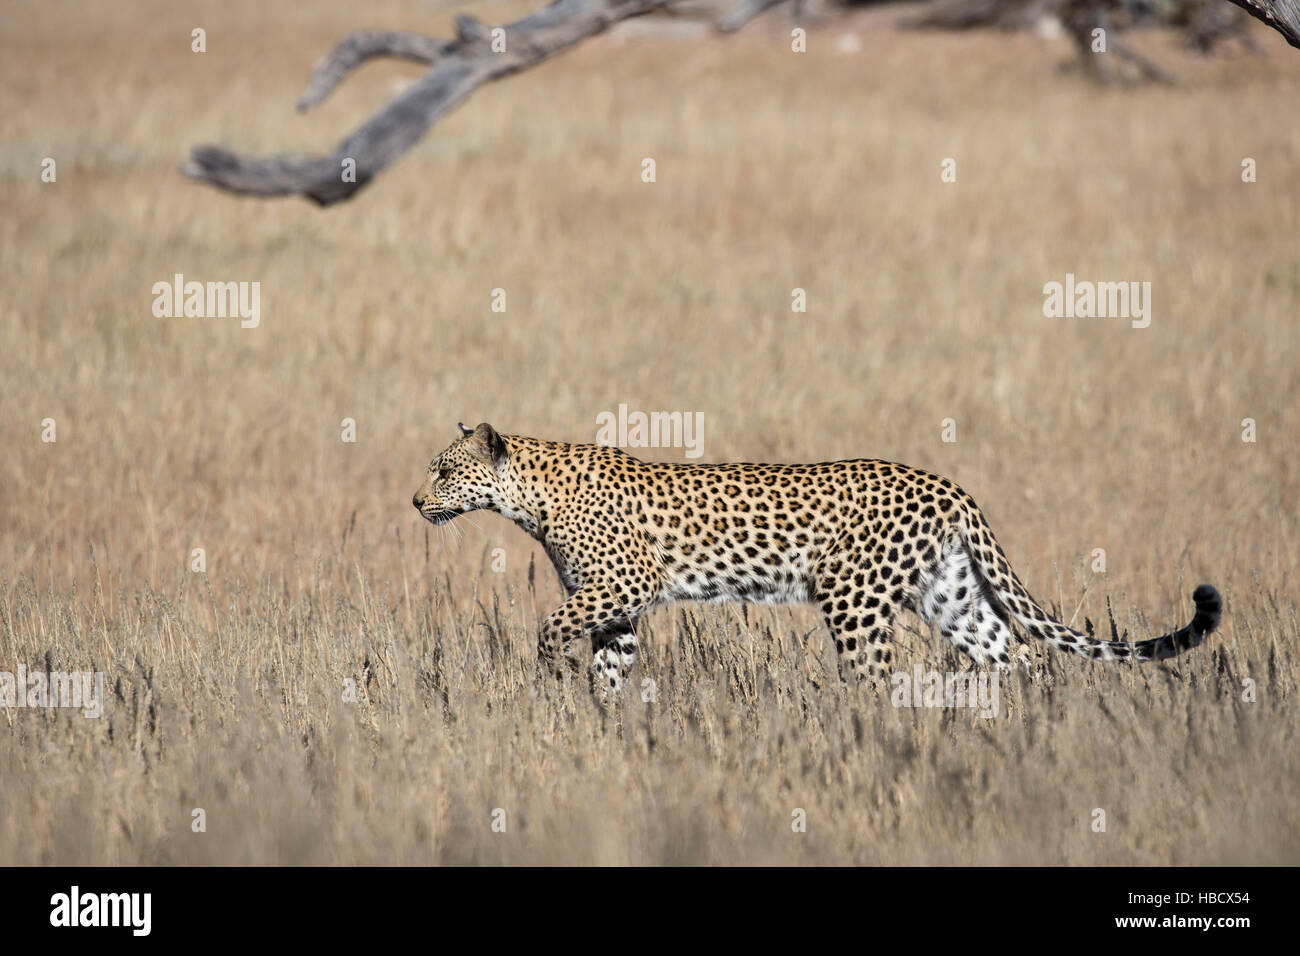 Leopard female (Panthera pardus), Kgalagadi transfrontier park, South Africa - Stock Image